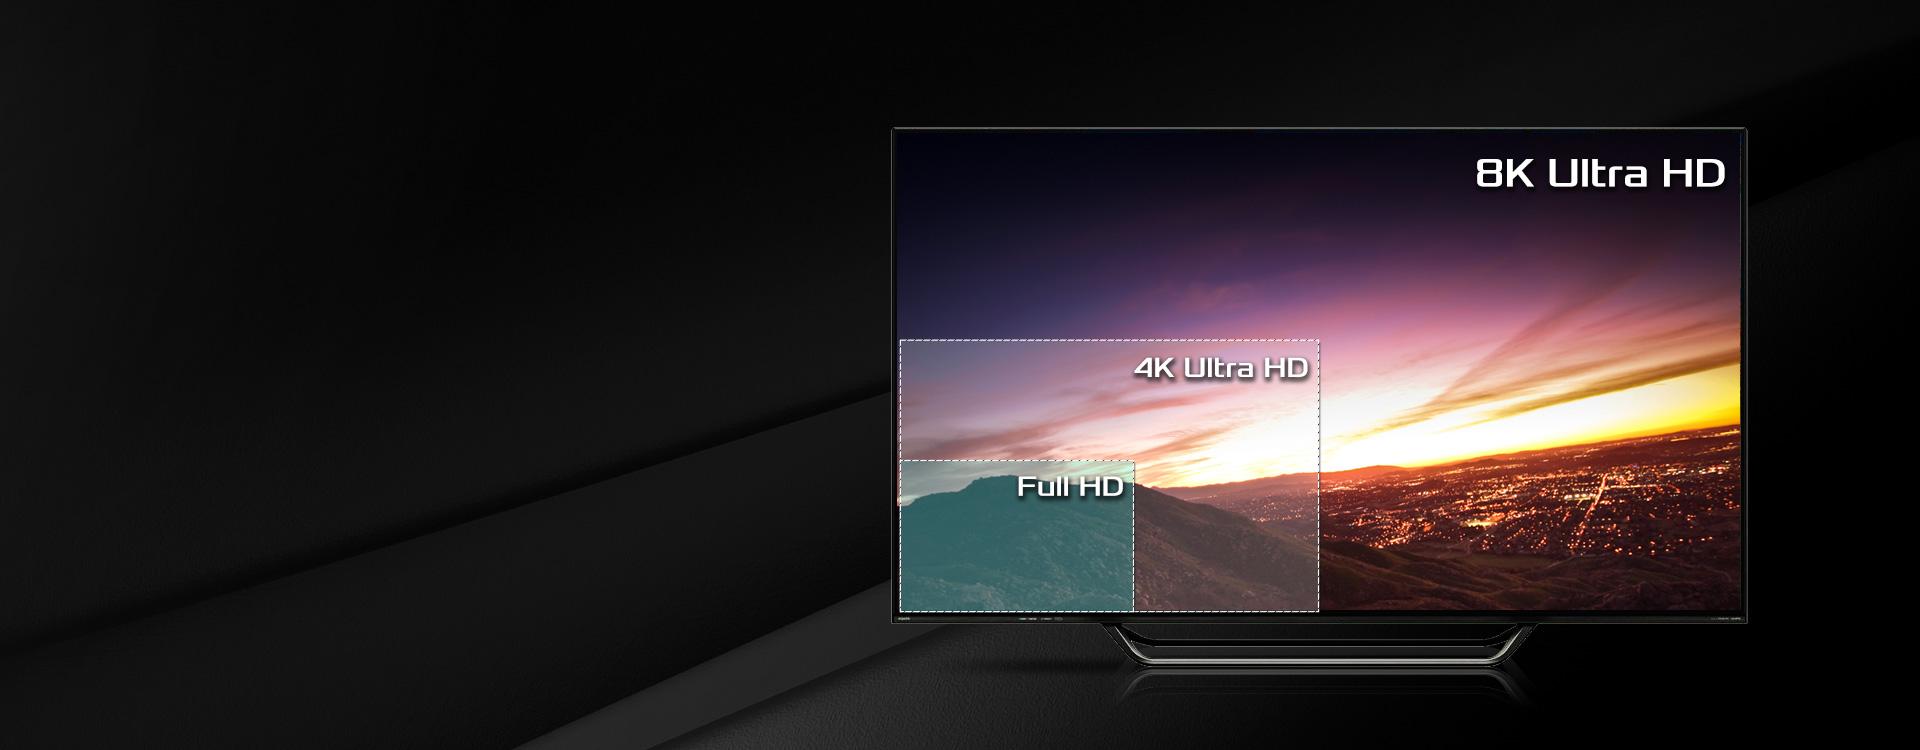 ASRock Video Card